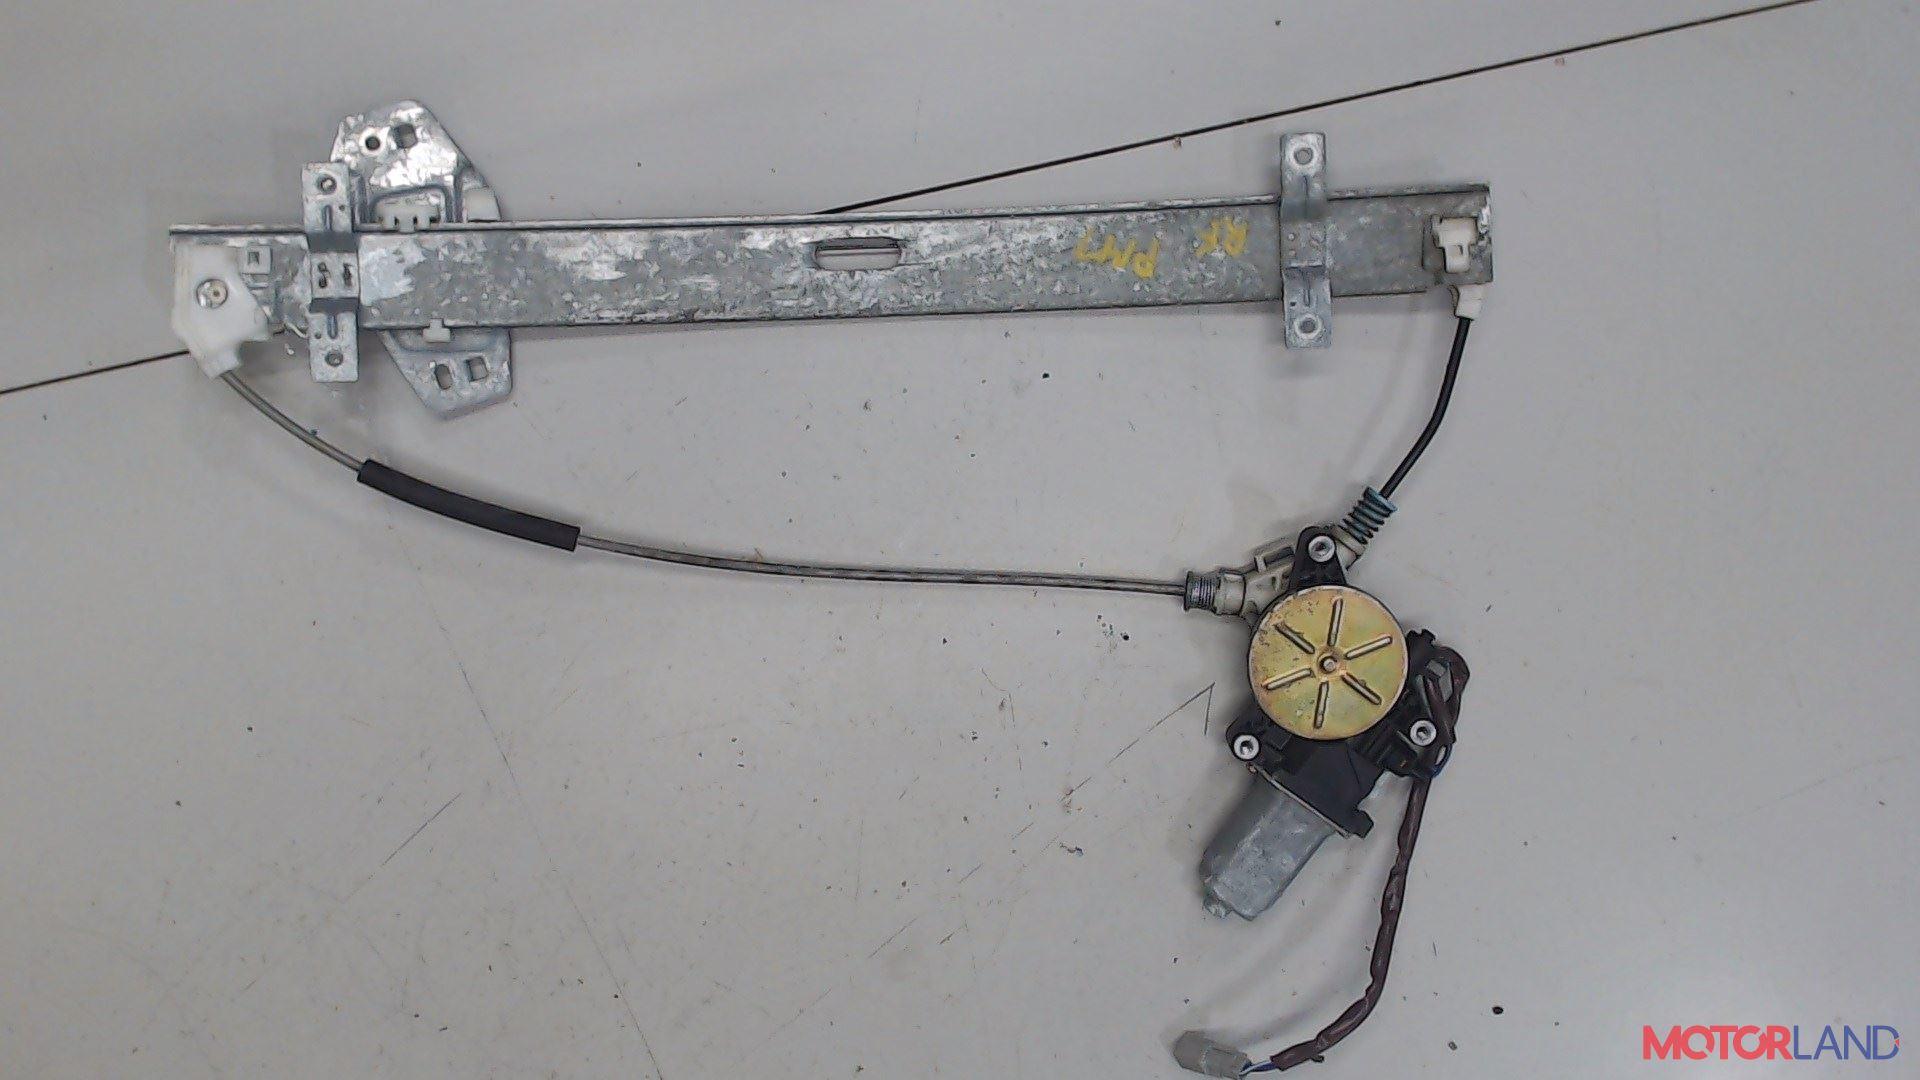 Стеклоподъемник электрический Acura MDX 2001-2006, Артикул 5510445 #1